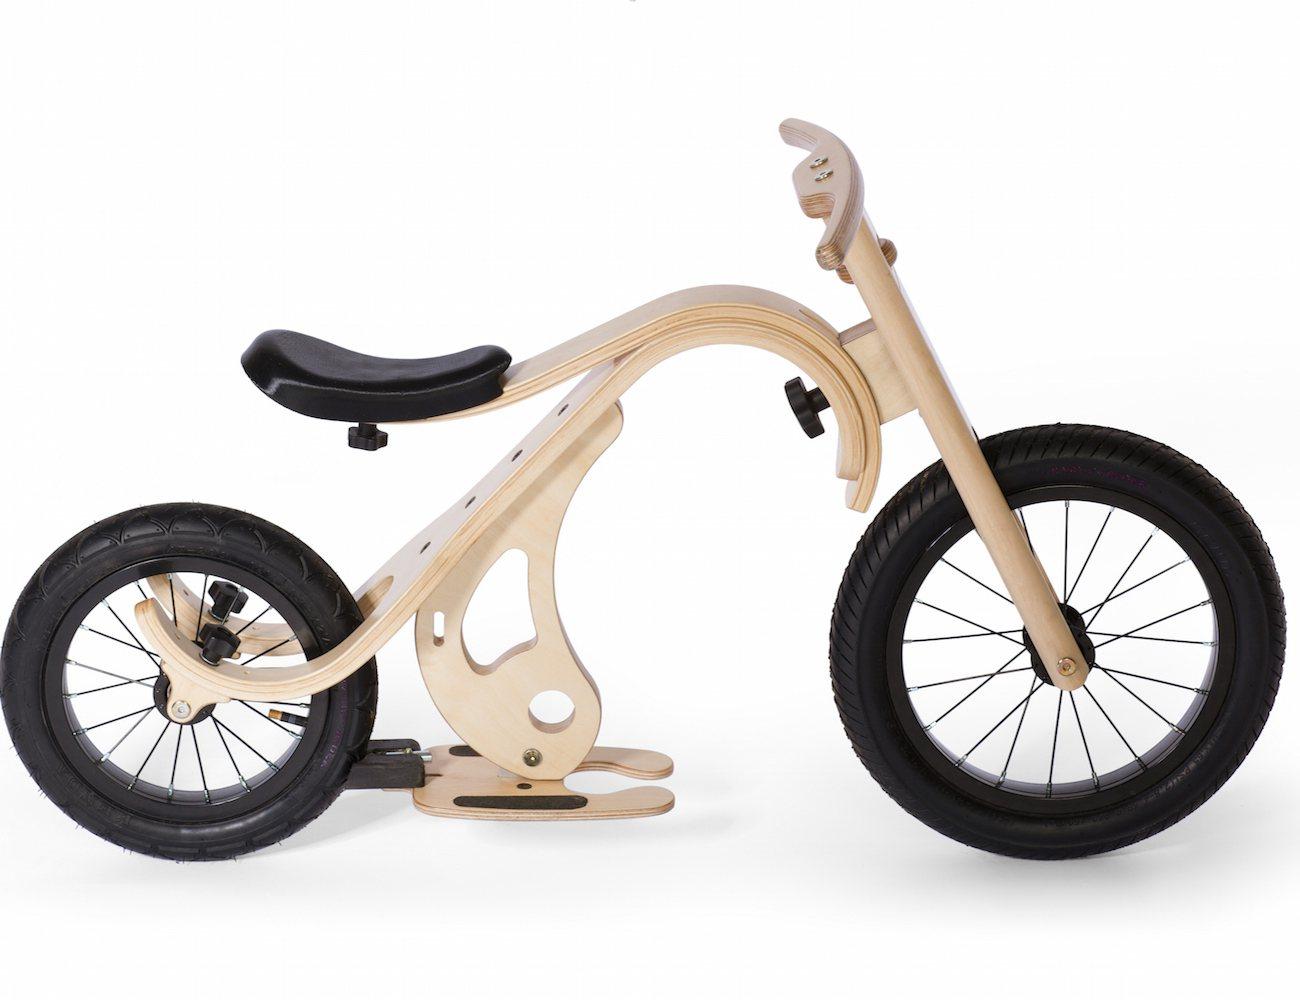 Leg&Go bike